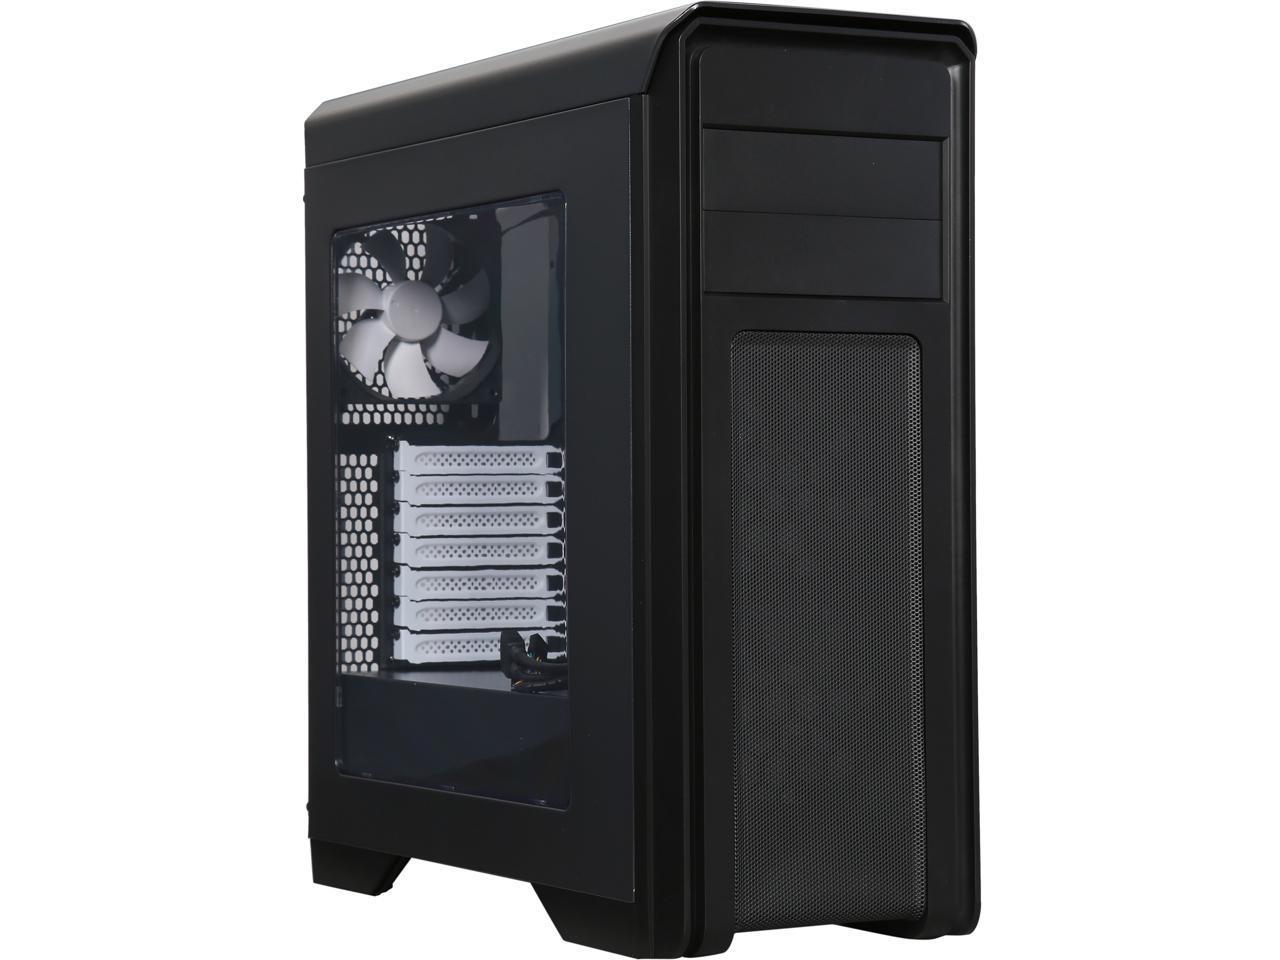 Diypc D480-BK-Window Dual USB 3.0 ATX Mid Tower Computer Case (Black )